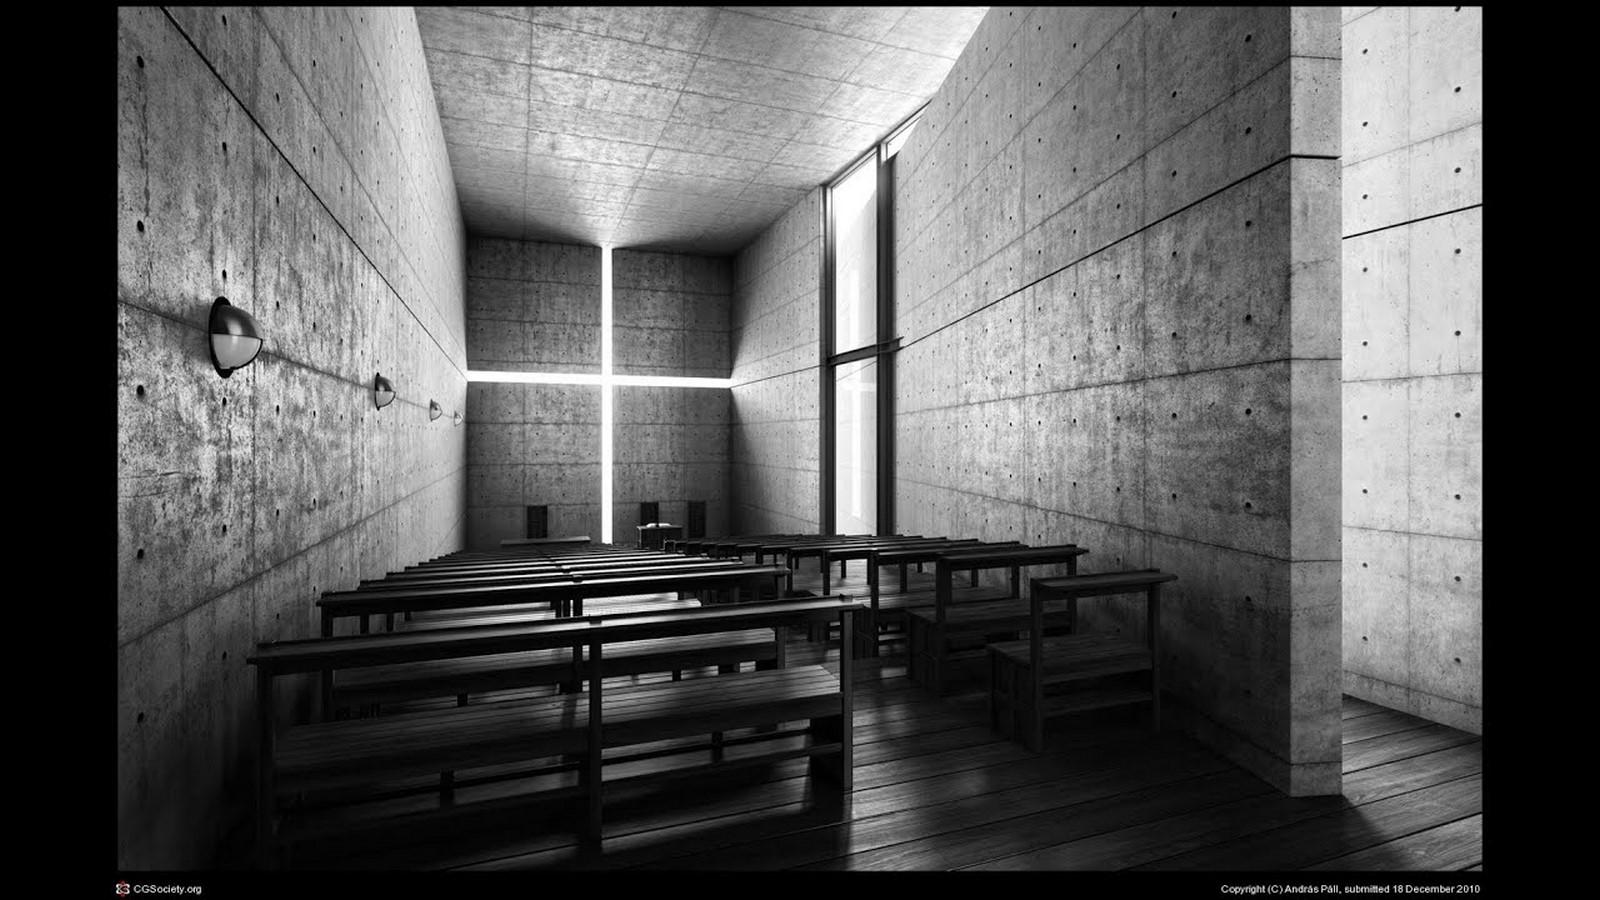 Architecture Concepts - Light: - Sheet1